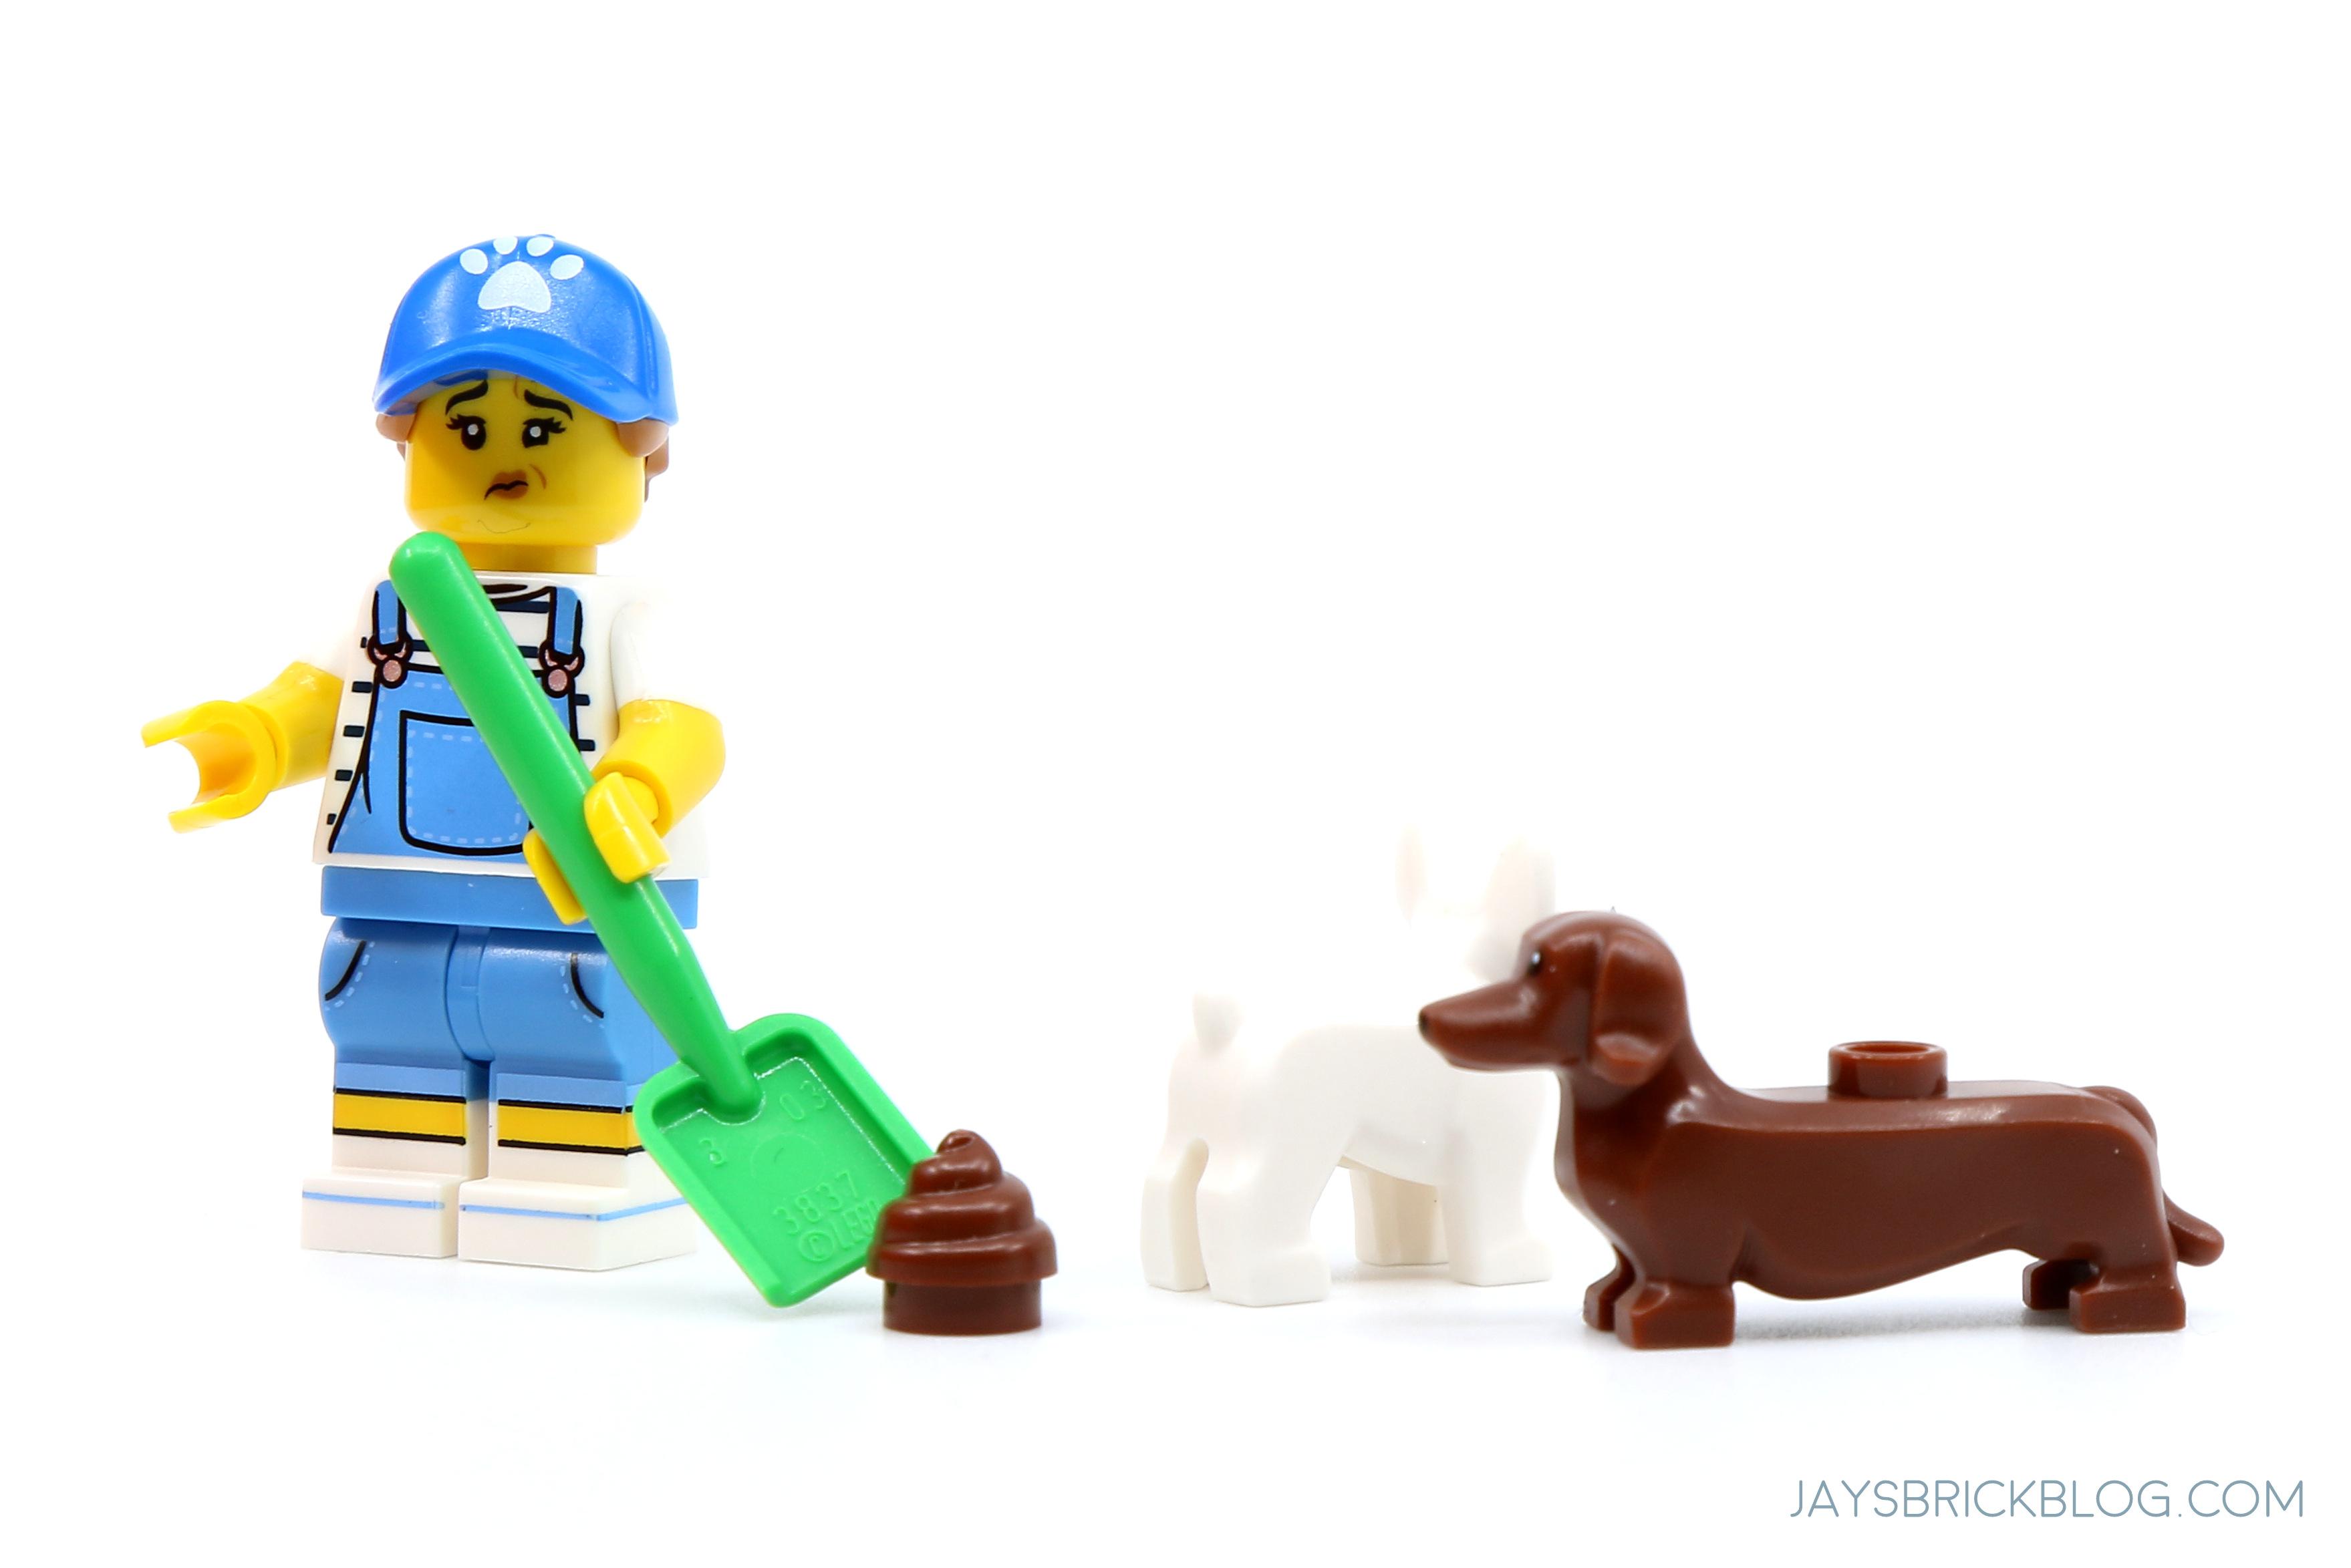 LEGO Animal pet fox Light Blue Gray